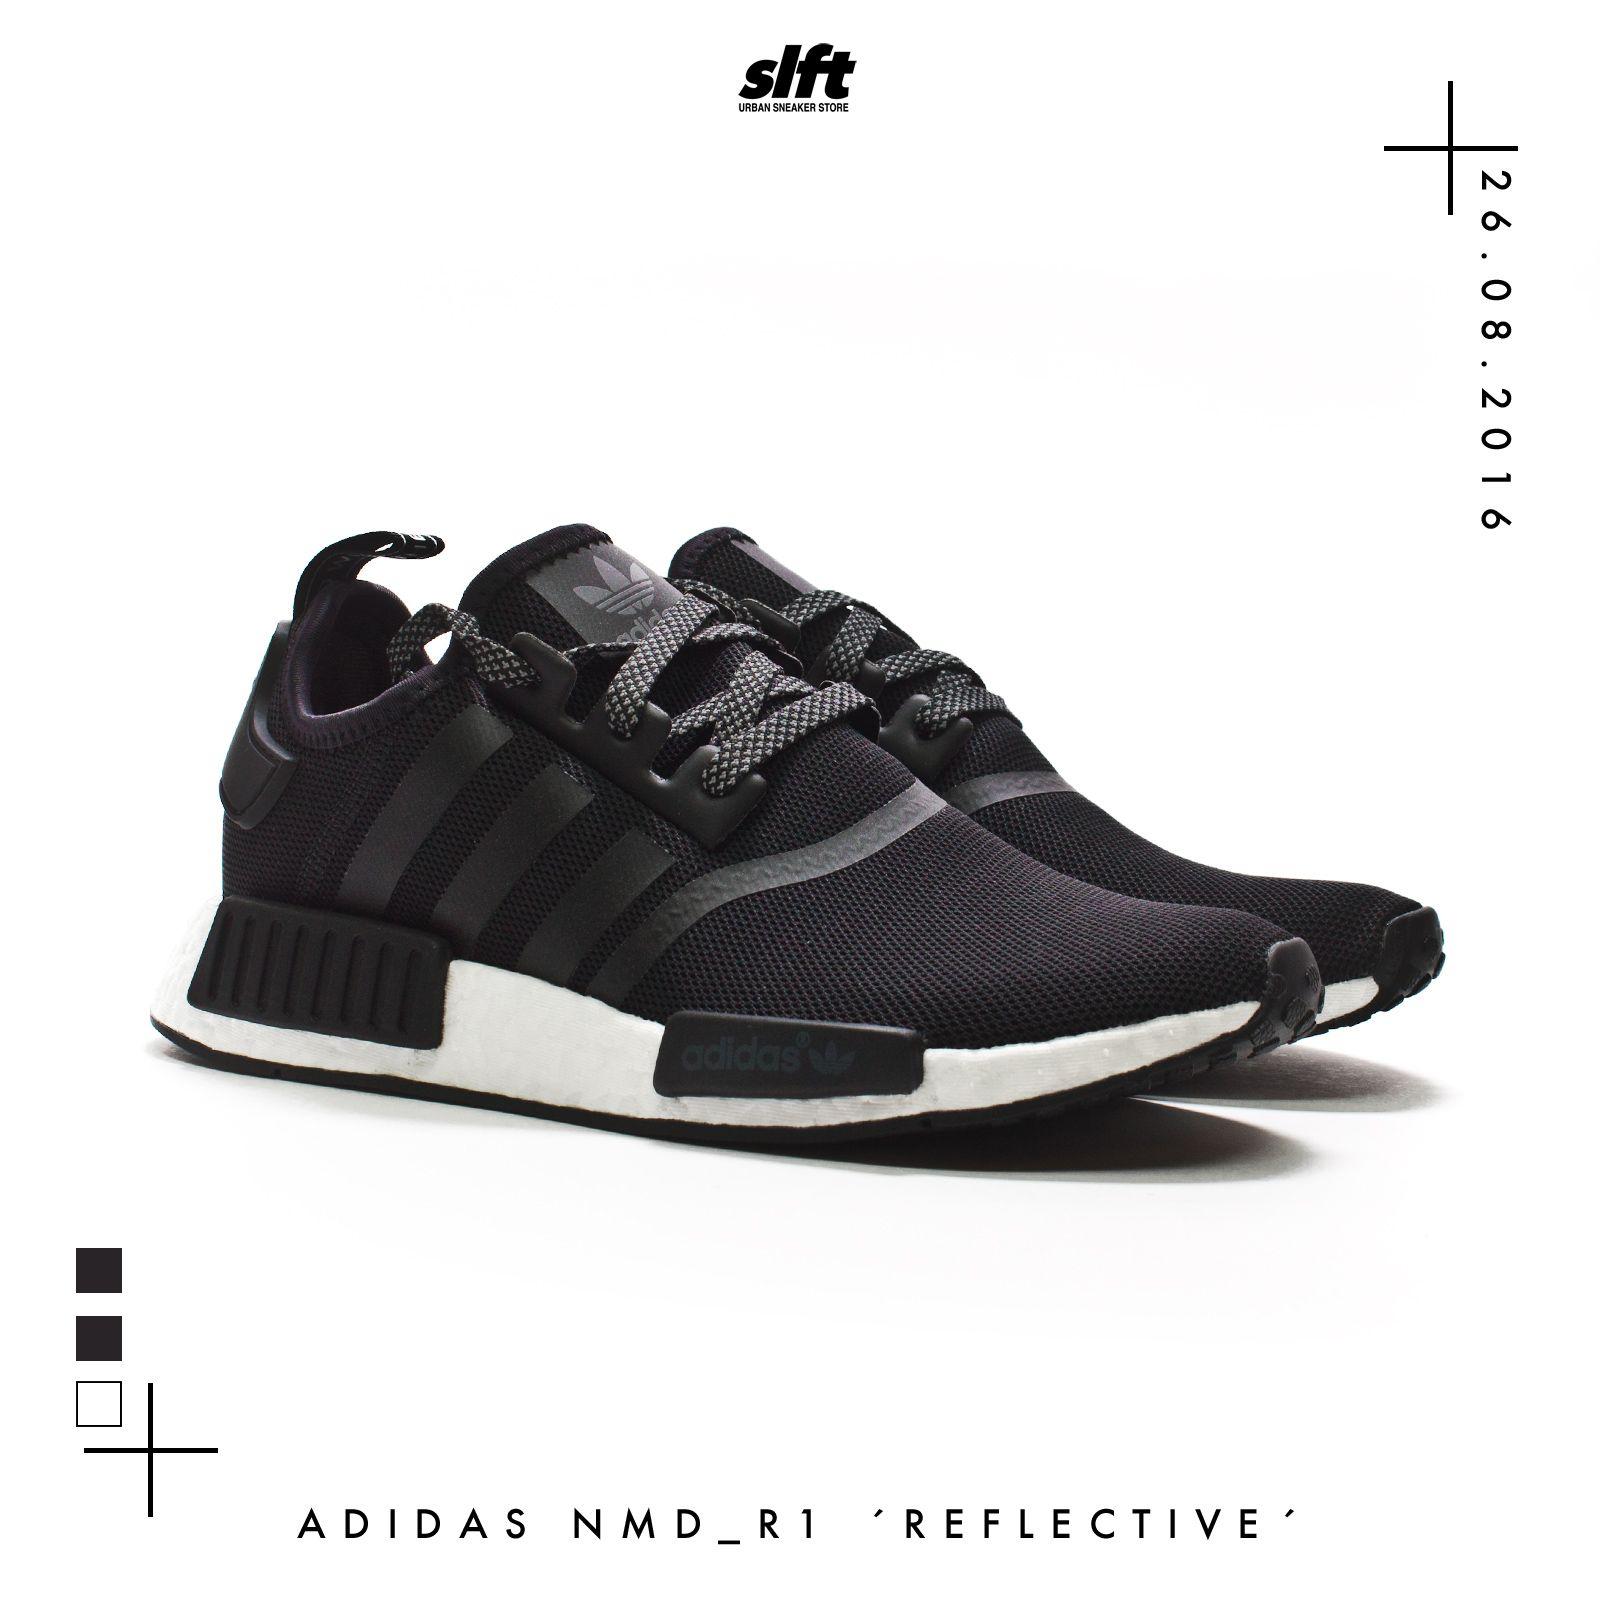 sports shoes 4ba19 be23f ... release date der adidas nmd r1 core black core black reflective white  aus dem reflective black